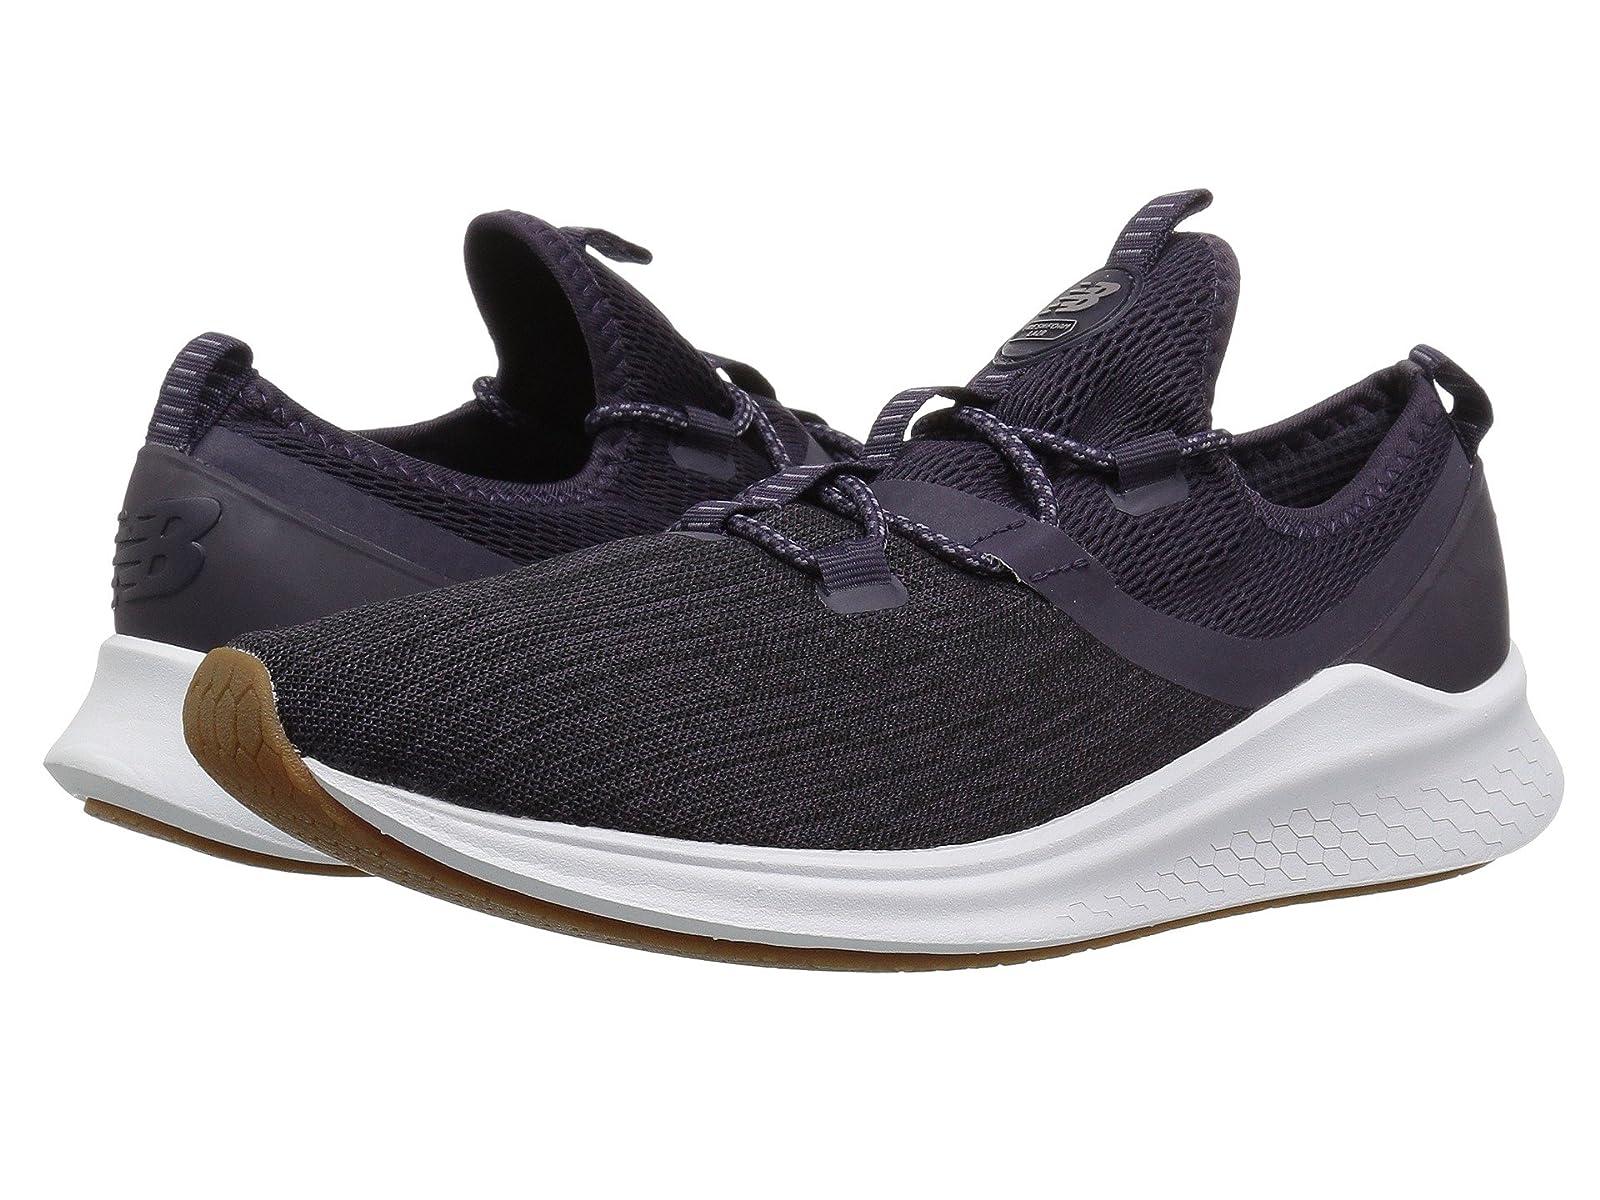 New Balance Fresh Foam LAZR v1 SportAtmospheric grades have affordable shoes